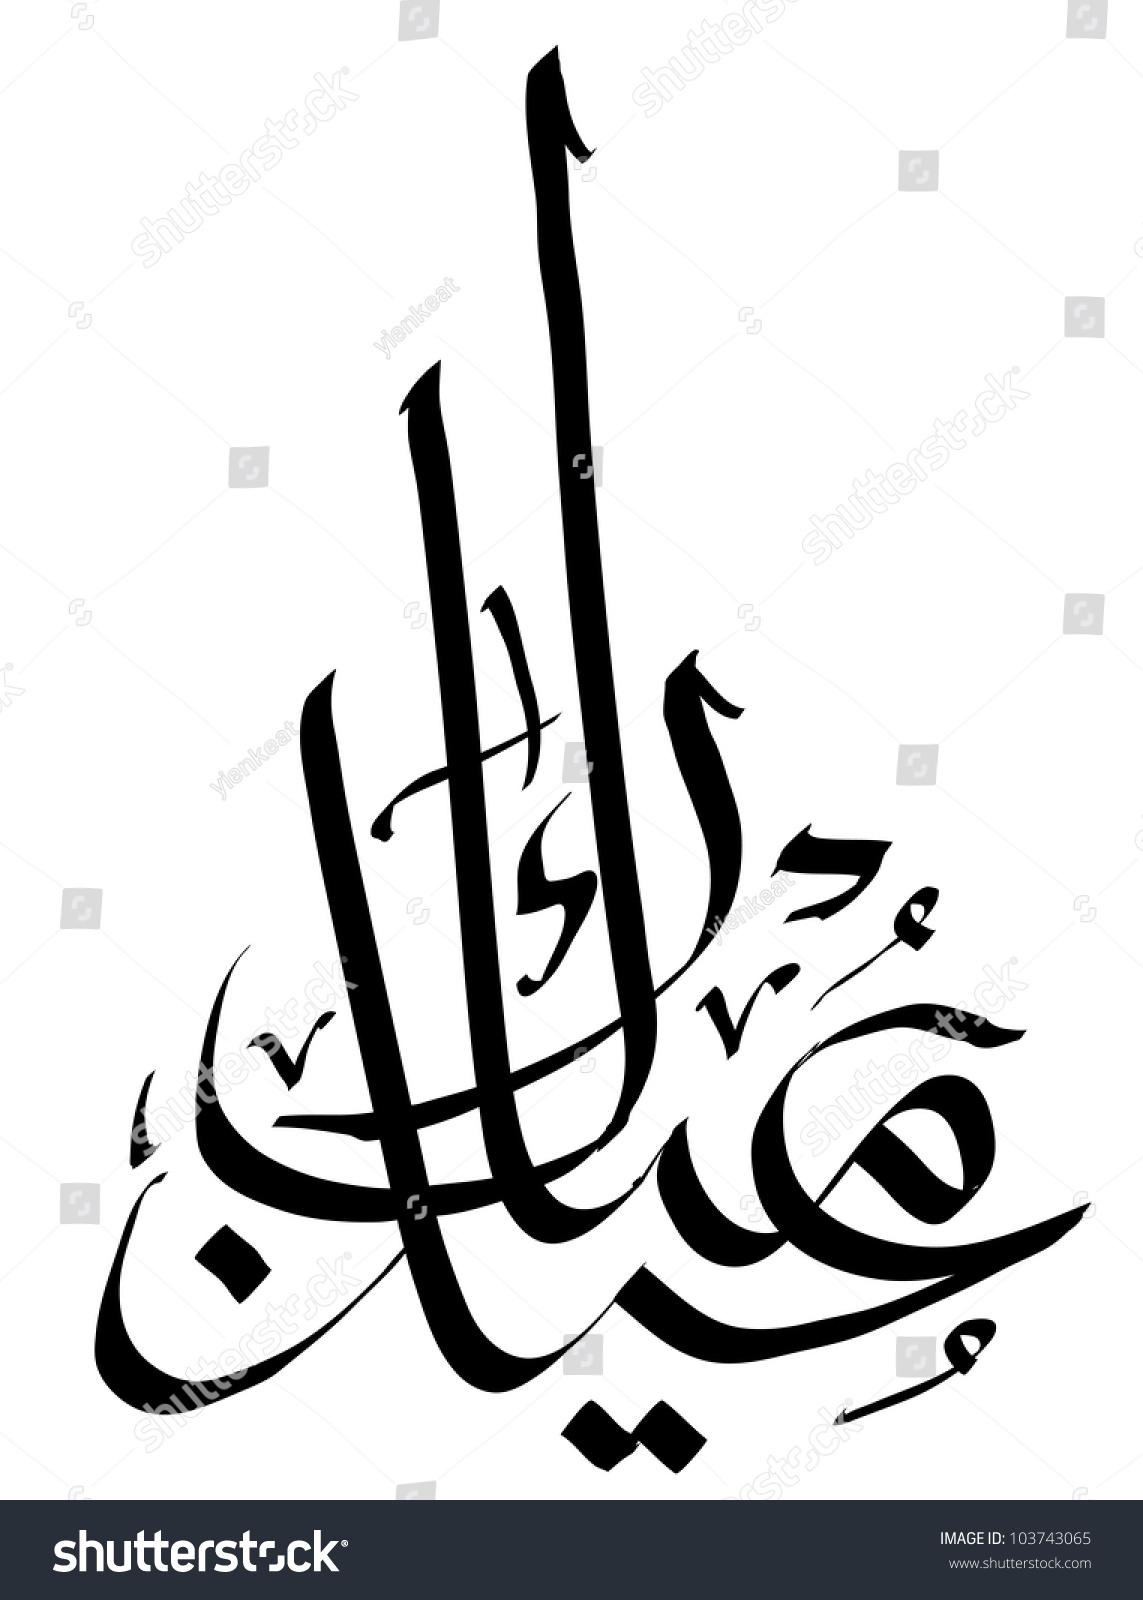 Arabic hand written greeting calligraphy eid stock illustration arabic hand written greeting calligraphy eid mubarak kristyandbryce Image collections